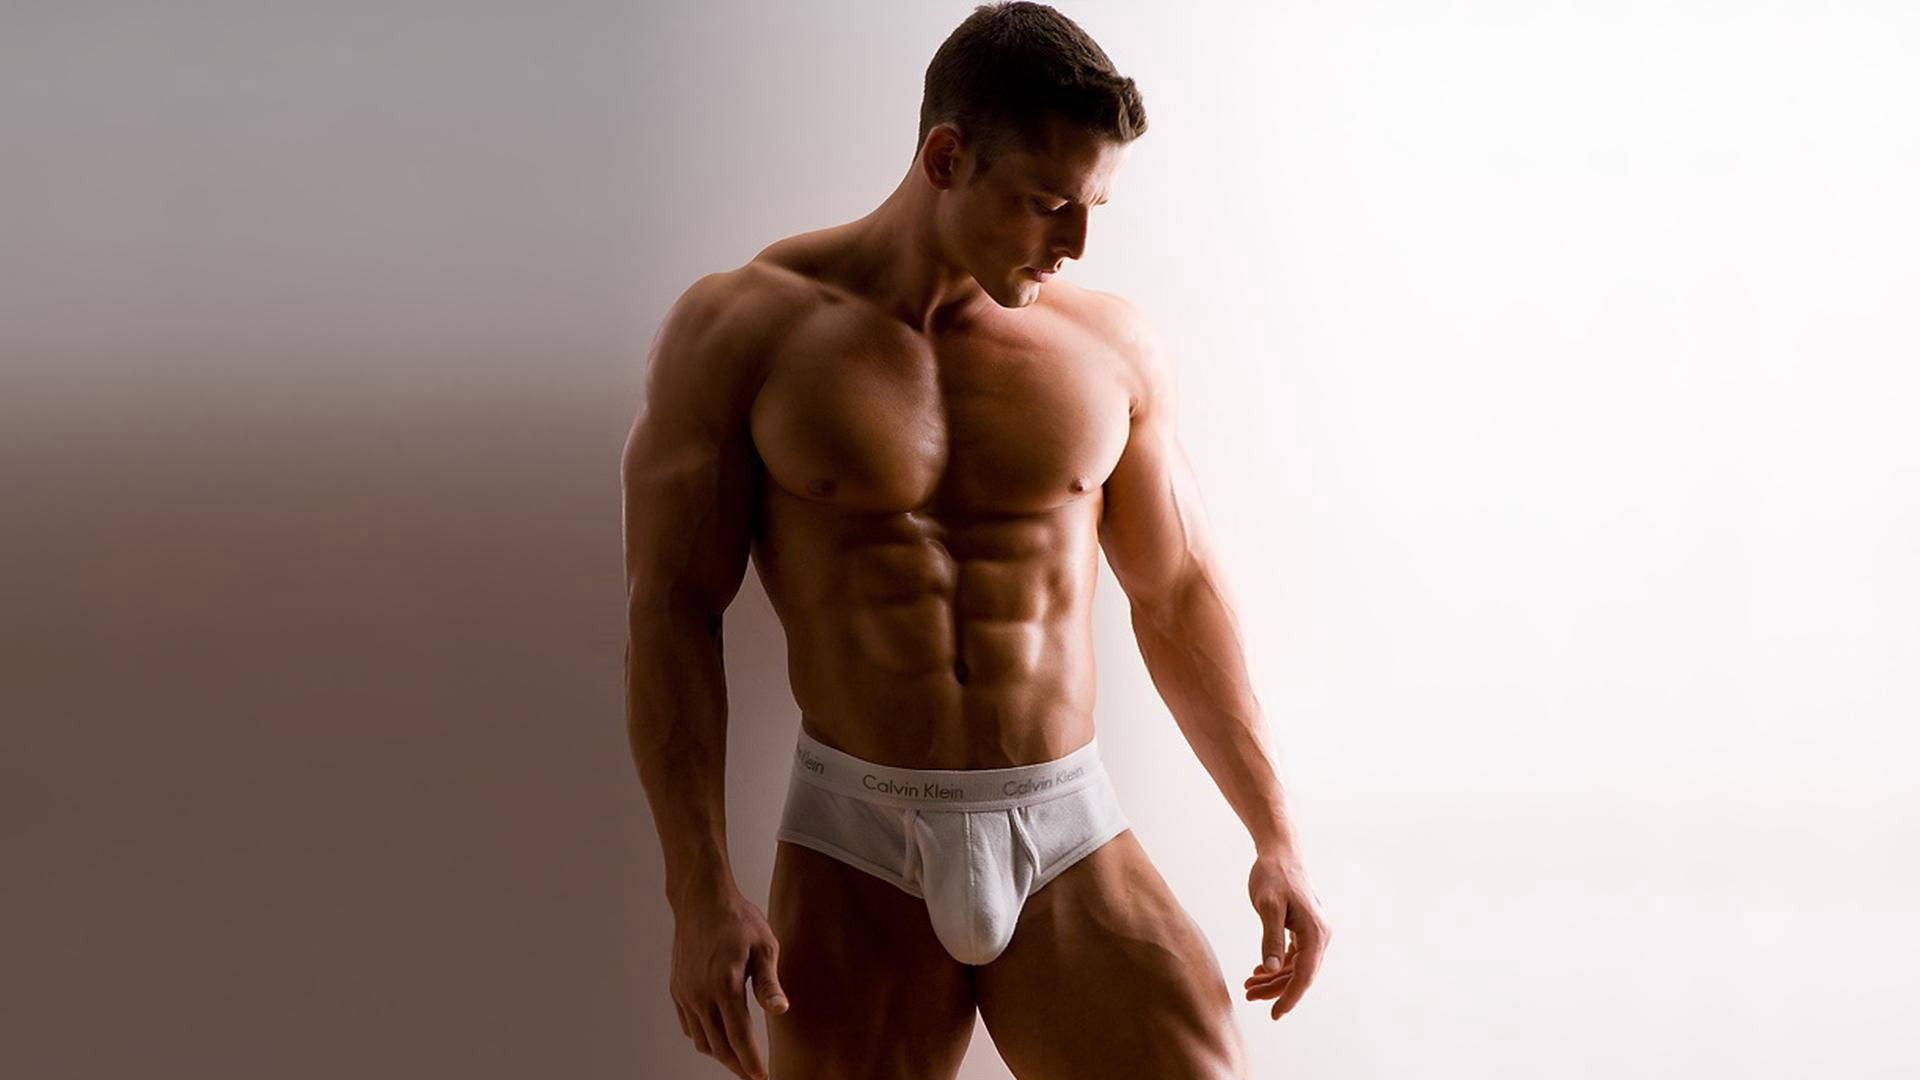 Картинки красивое тело мужчины, девочке